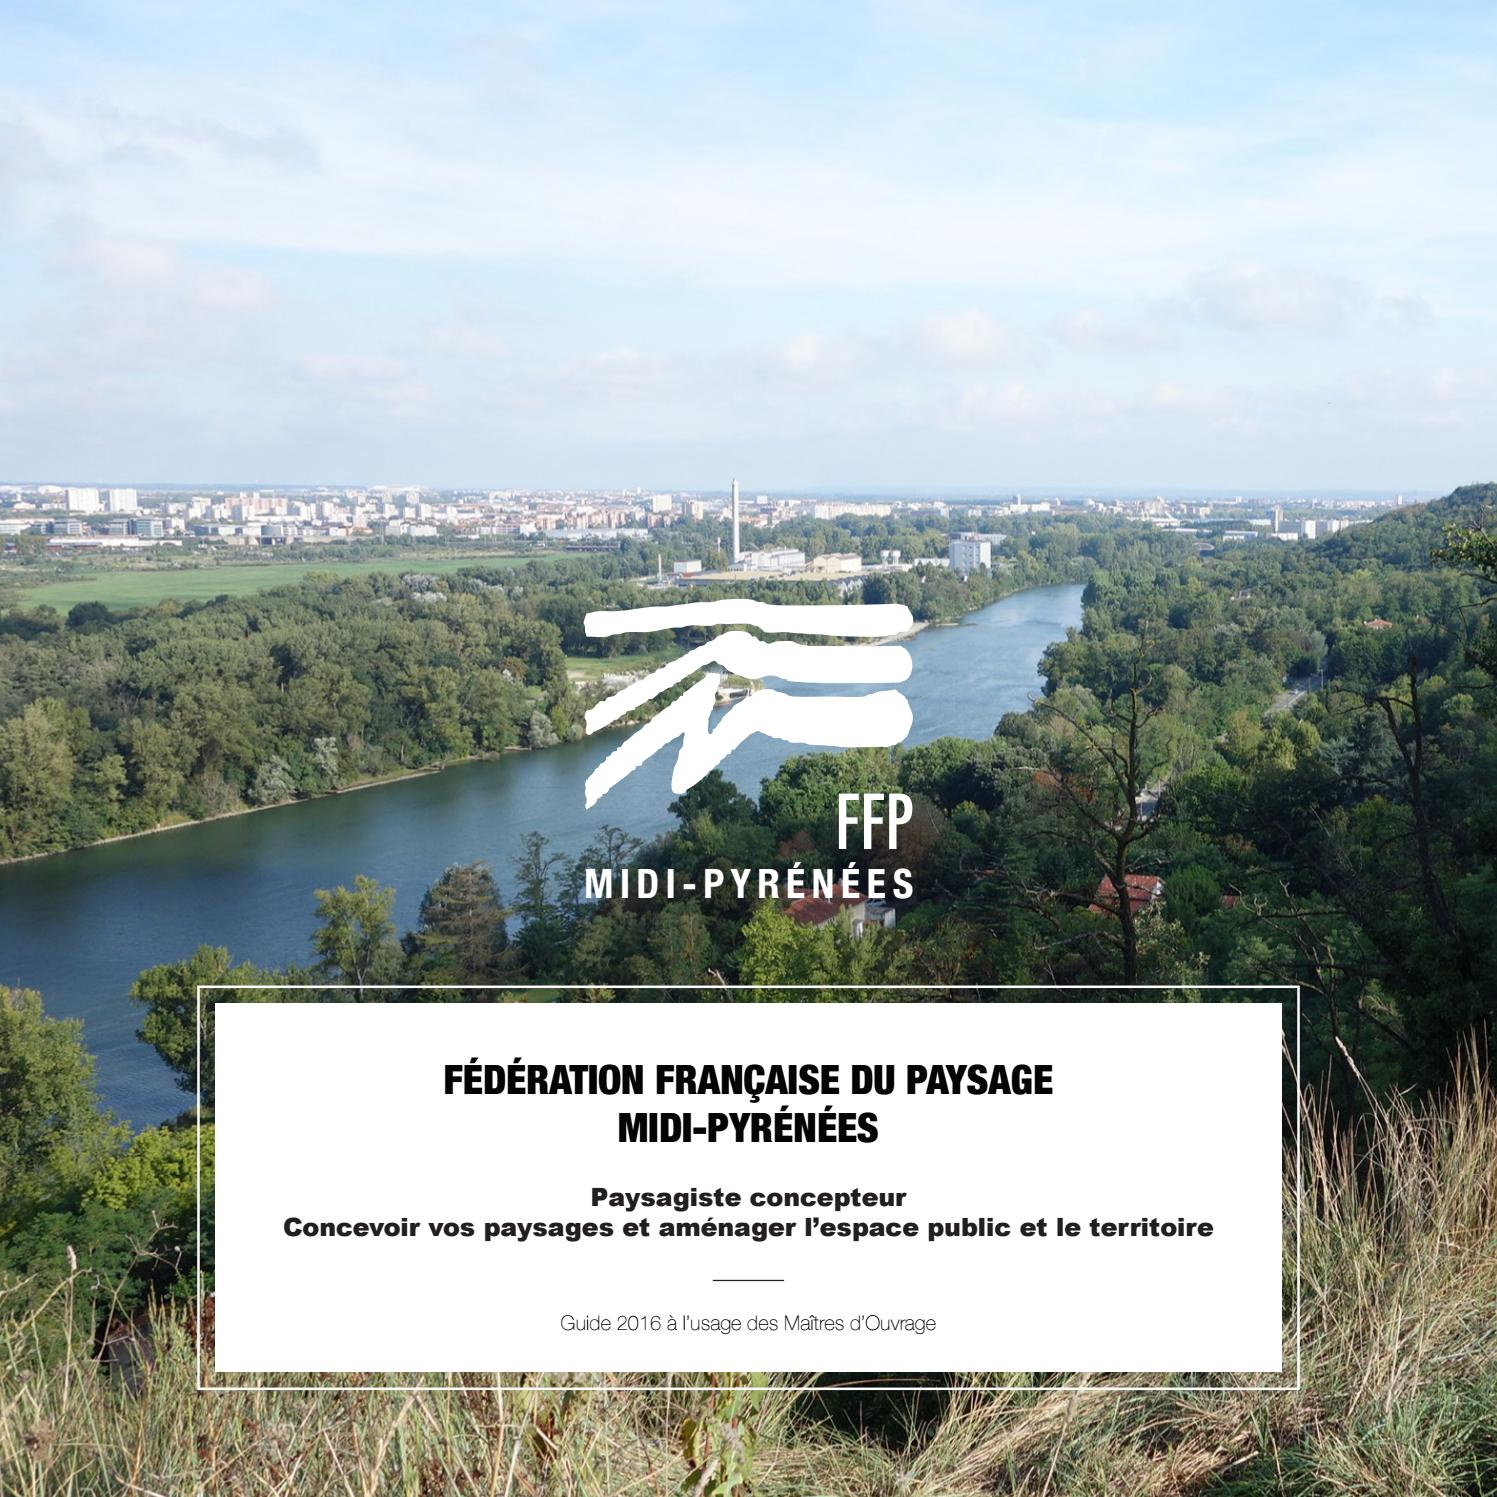 Architecte Paysagiste Midi Pyrénées ffp mp plaquette 2016ffp midi-pyrénées - issuu